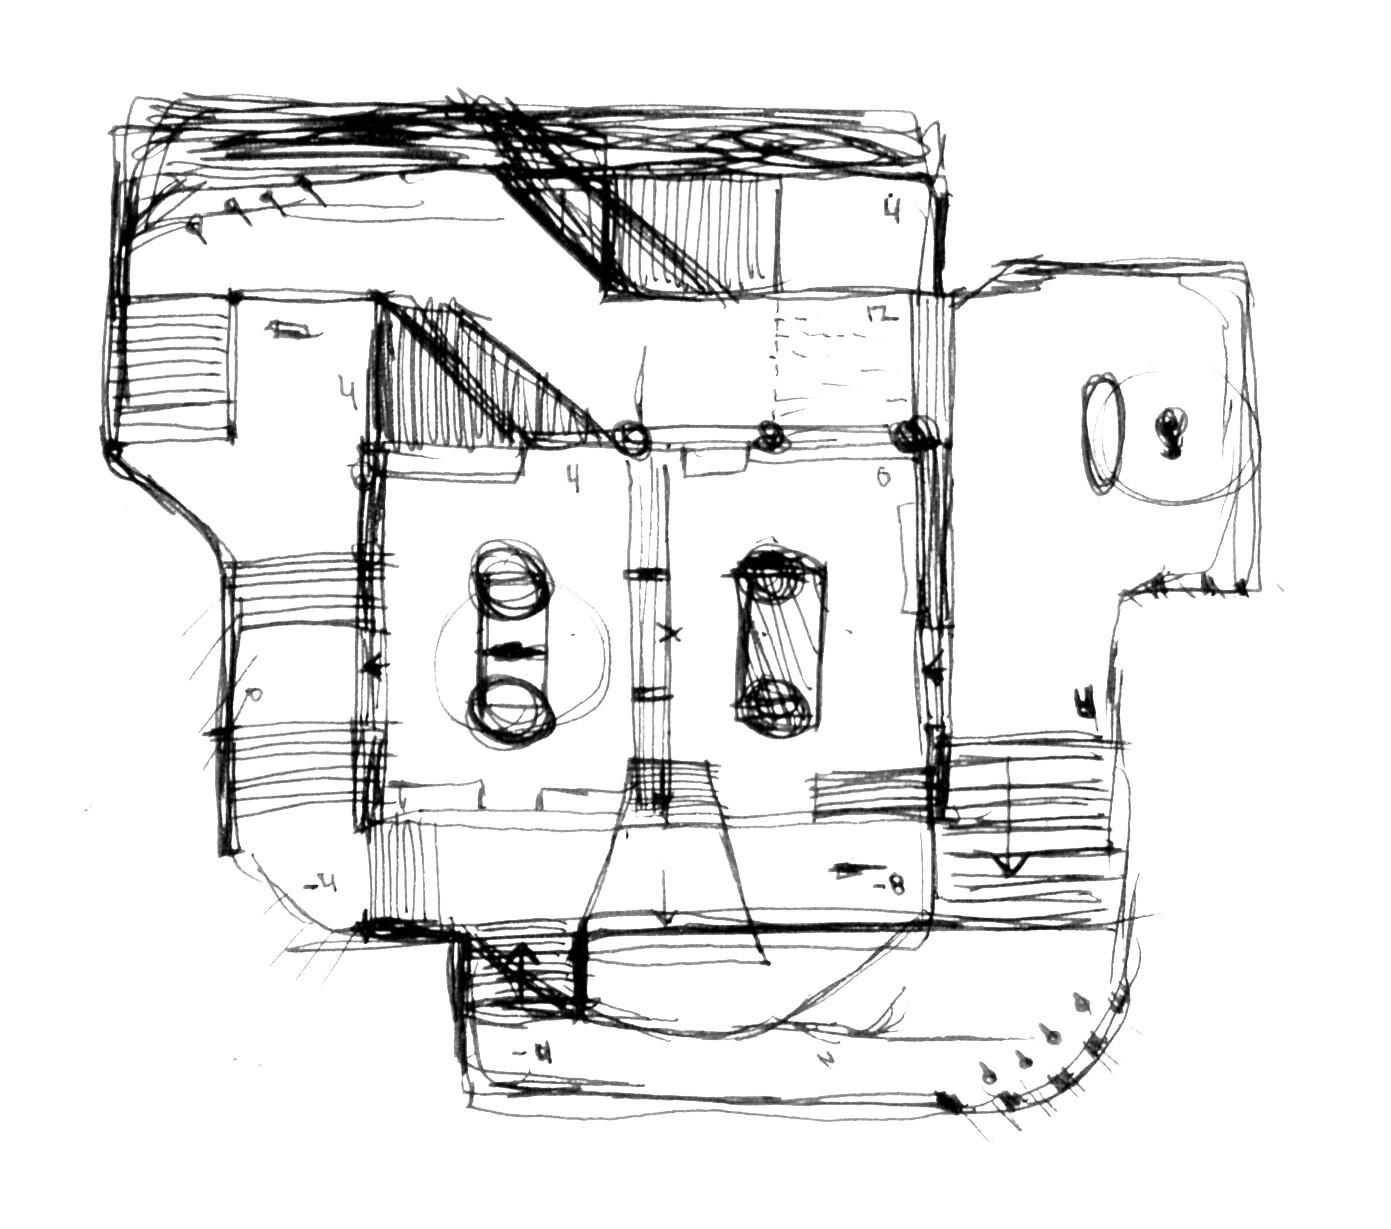 Original layout sketch